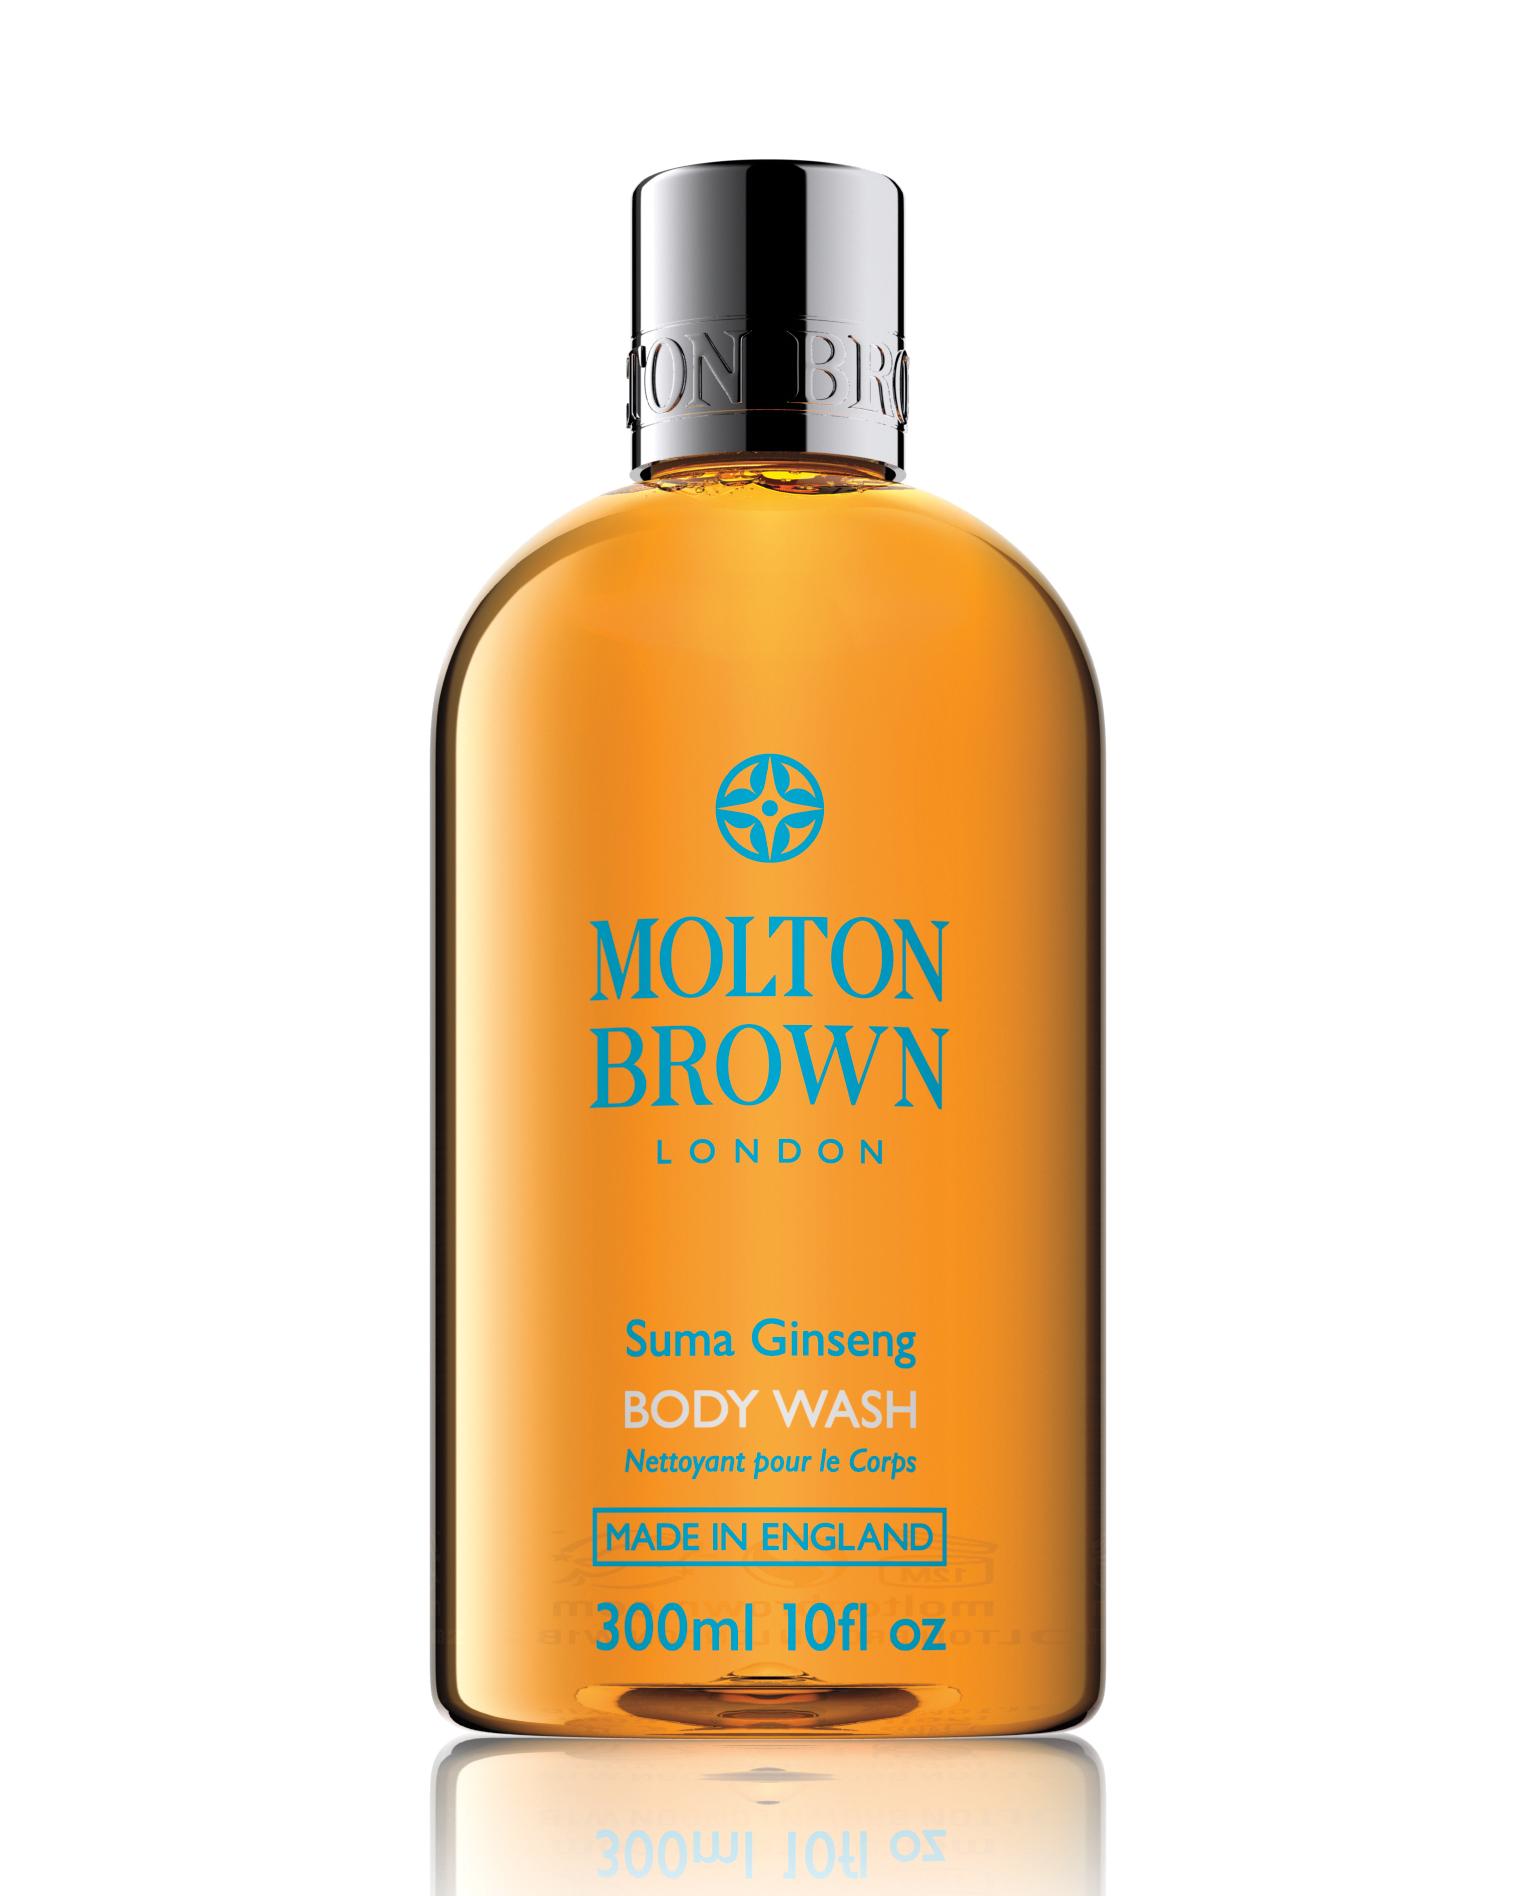 leslie-blodgett-beauty-picks-molton-brown-suma-ginseng-body-wash-0514.jpg